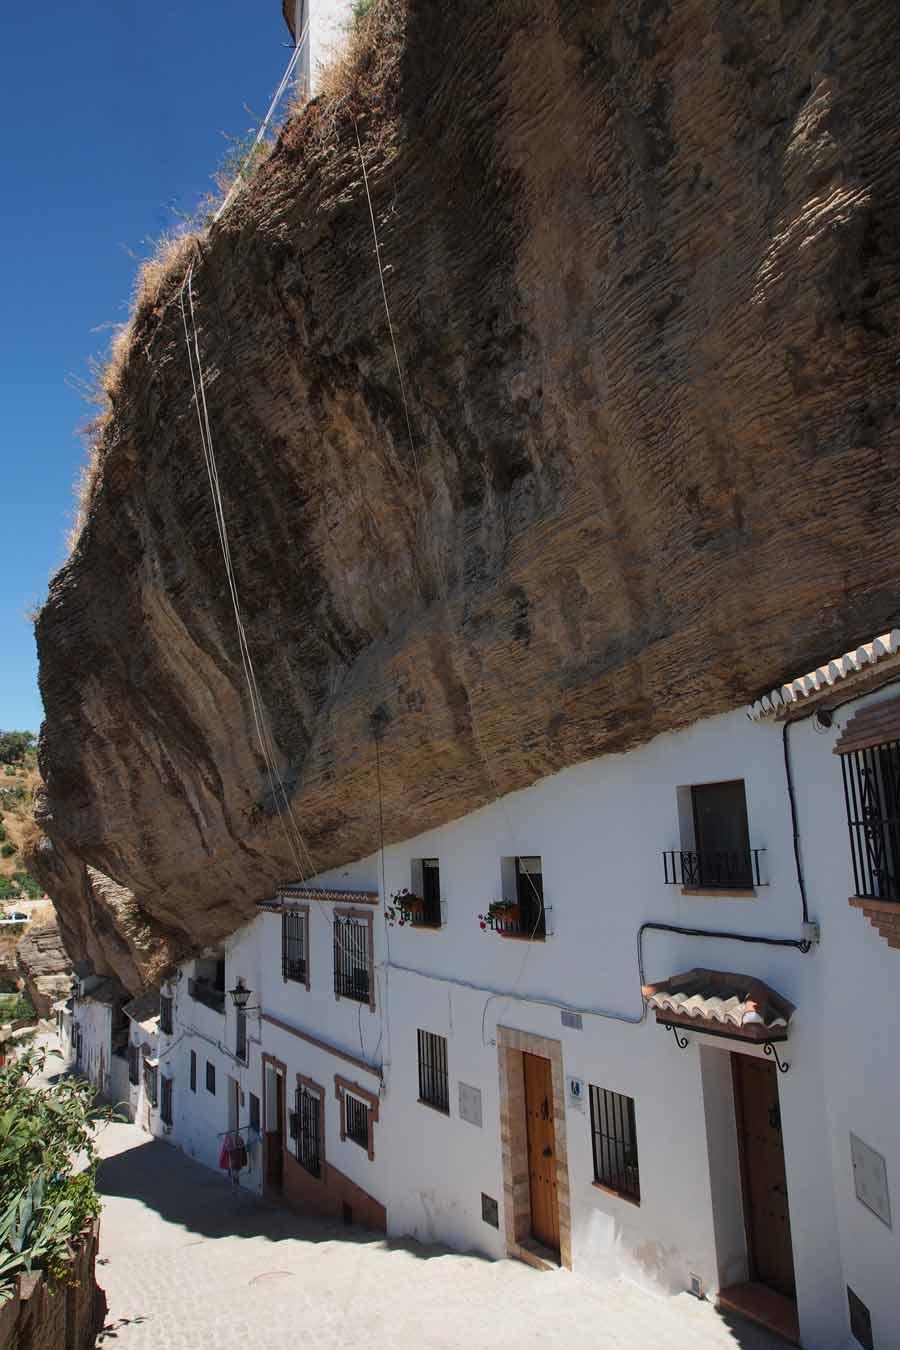 Casa Cueva en Setenil de las Bodegas